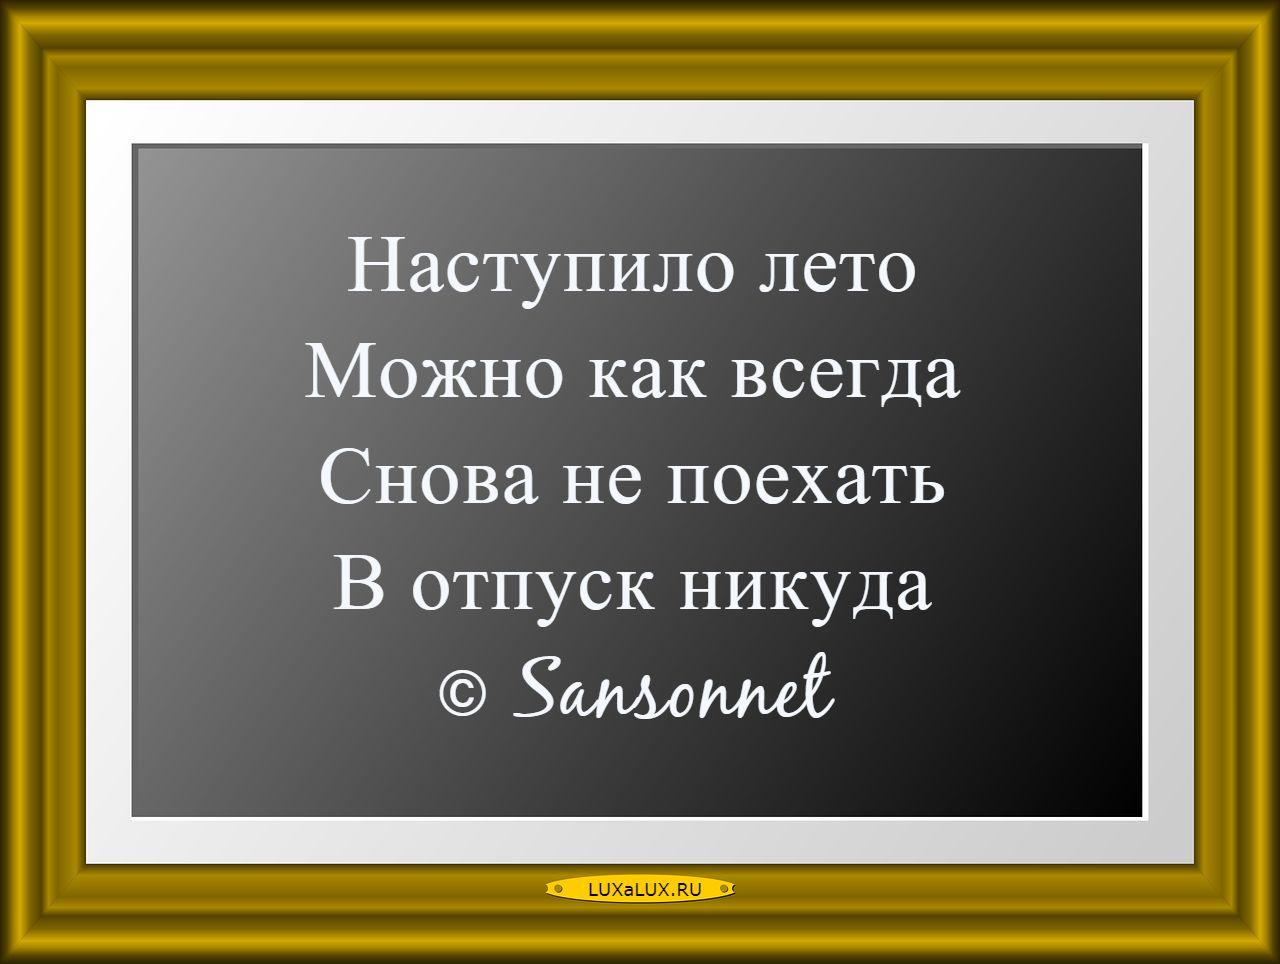 depresnyashki-post-luxalux-7